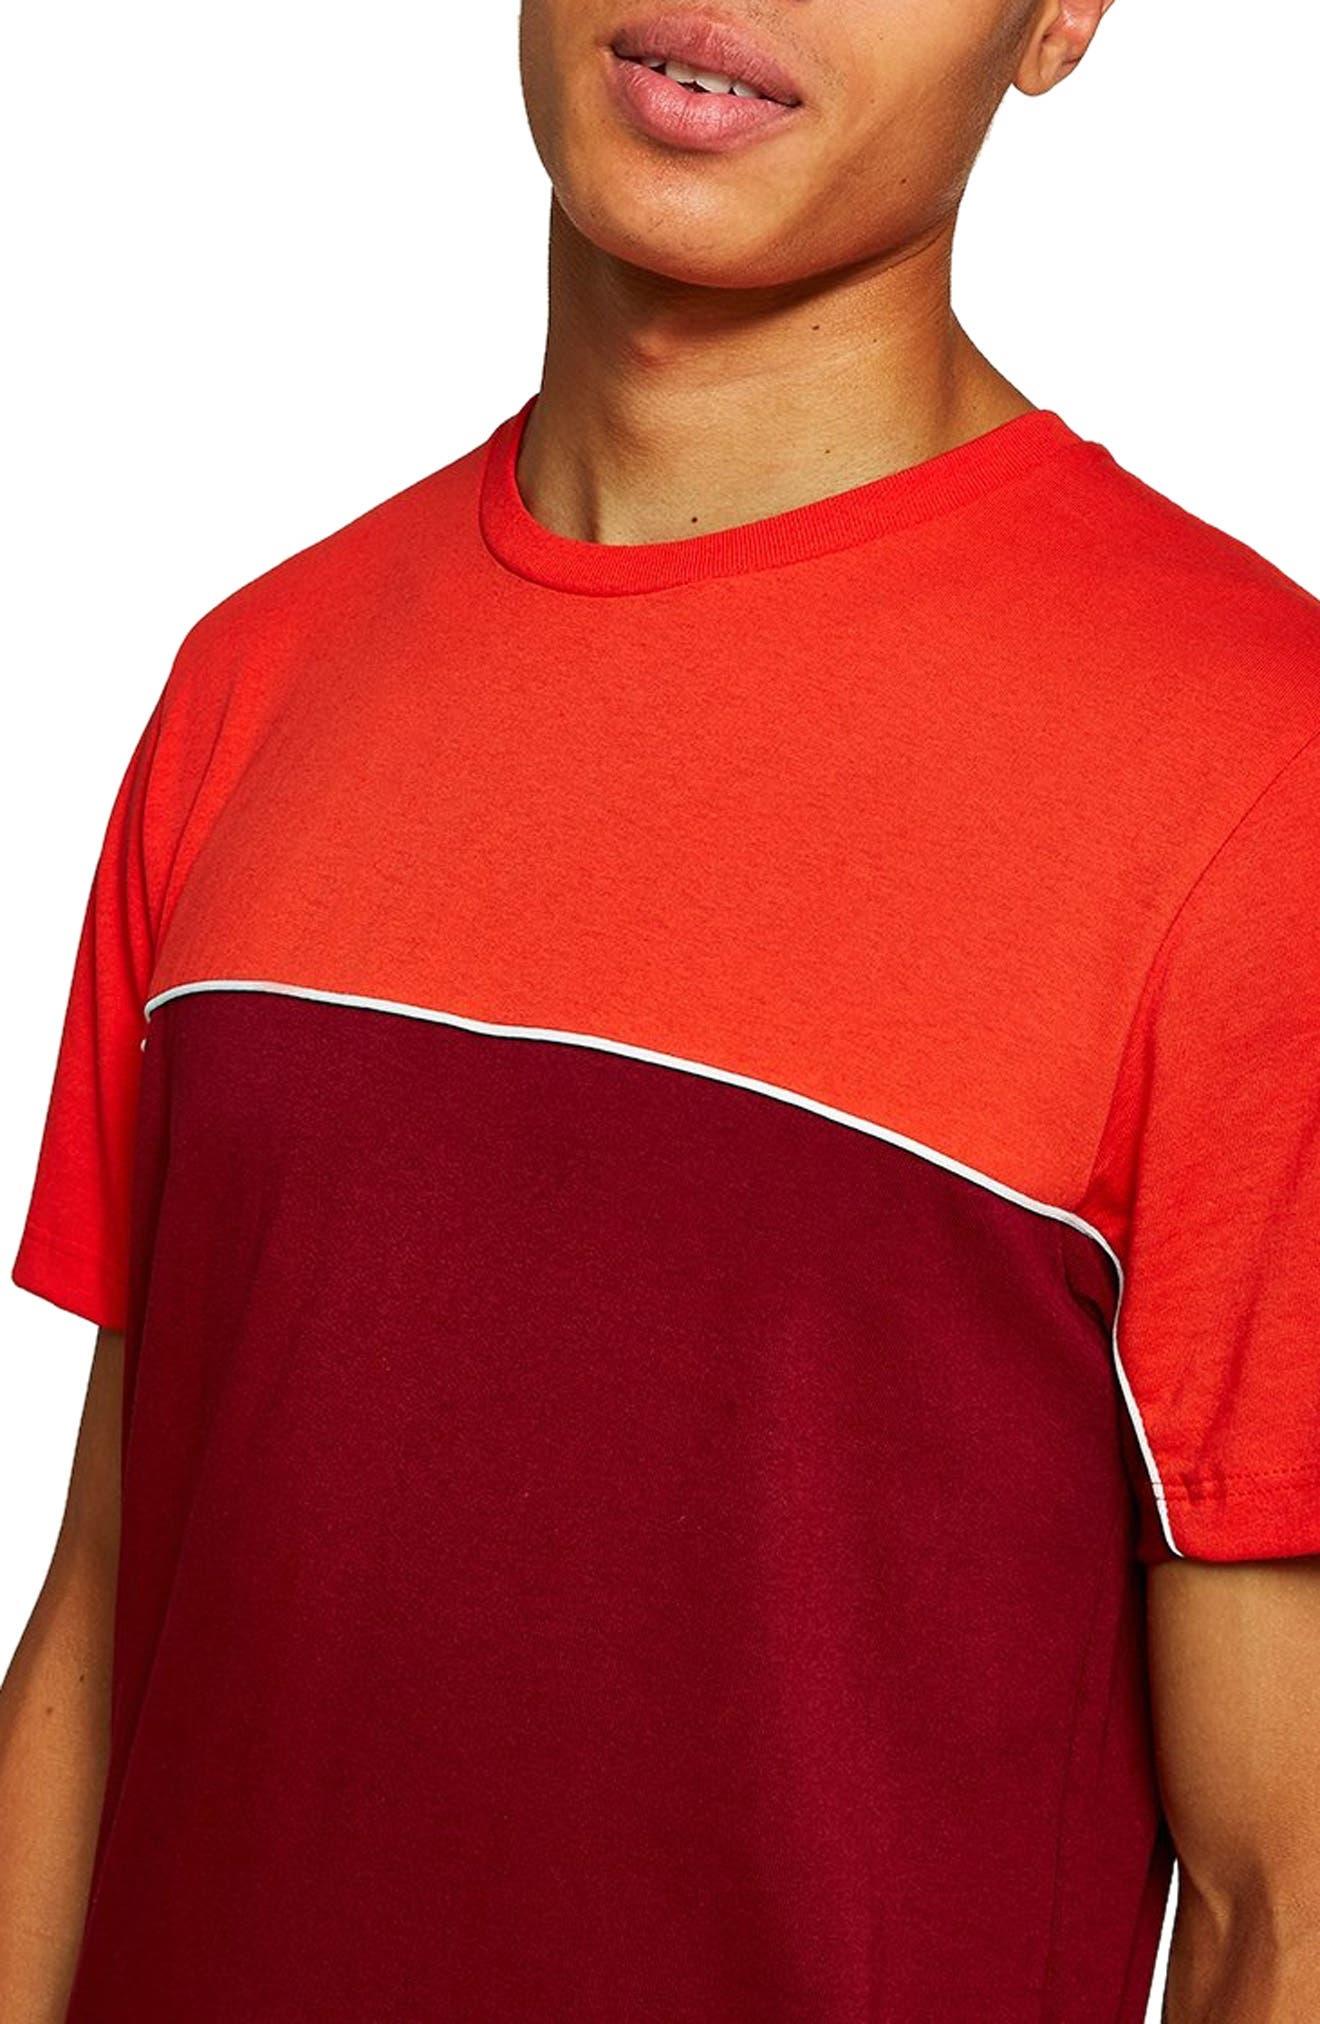 Colorblock T-Shirt,                         Main,                         color, RED MULTI